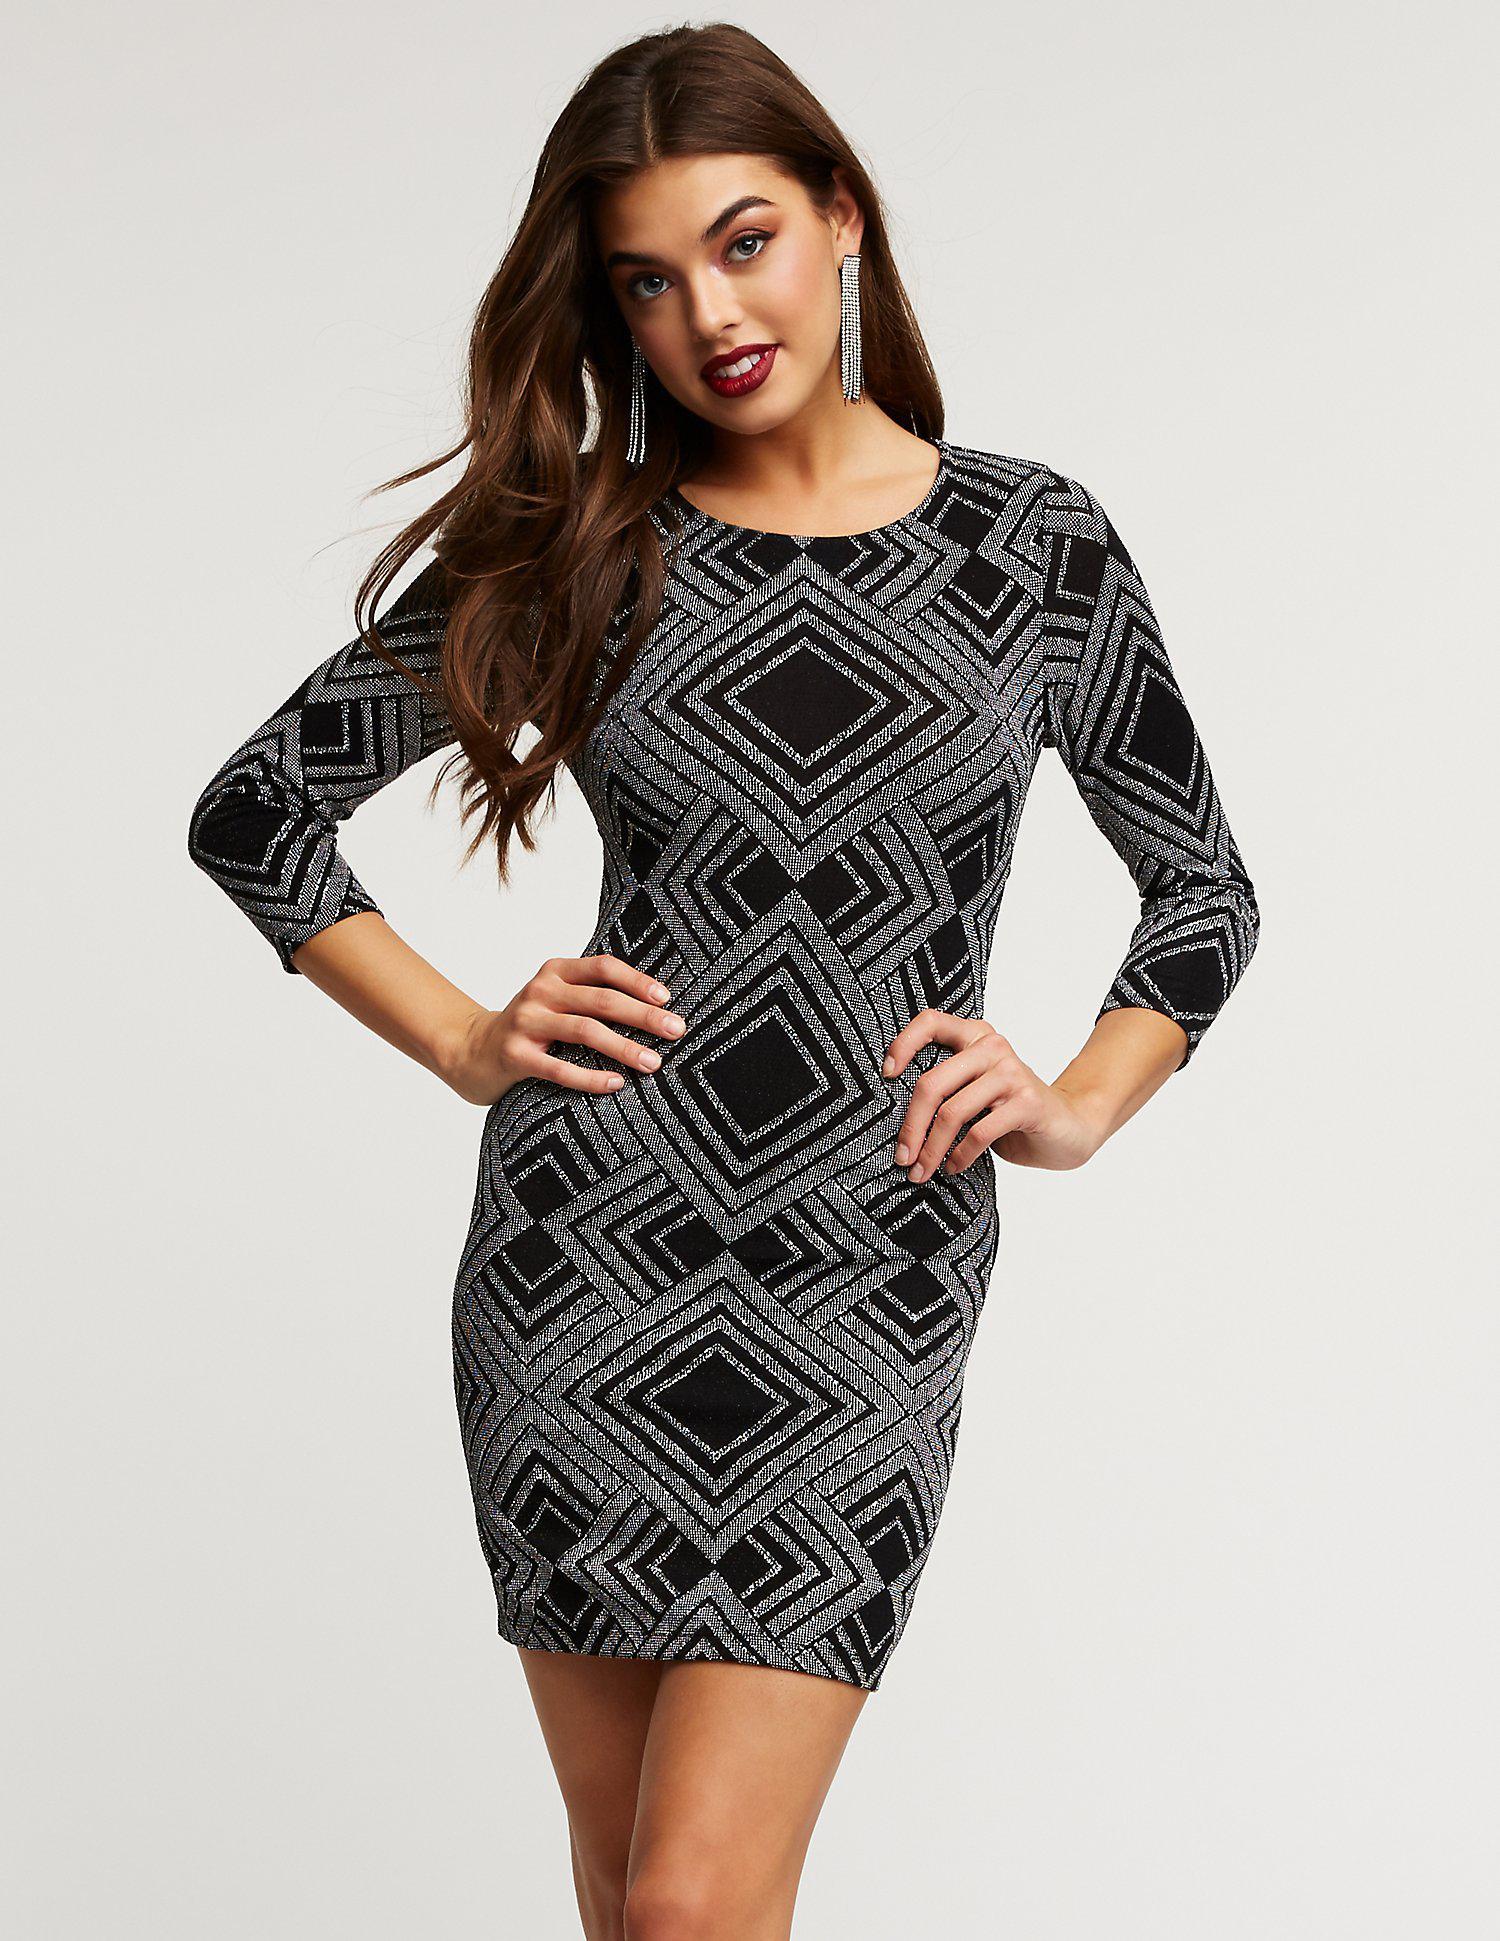 d429c3423d80 Charlotte Russe. Women's Black Glitter Geometric Print Bodycon Dress